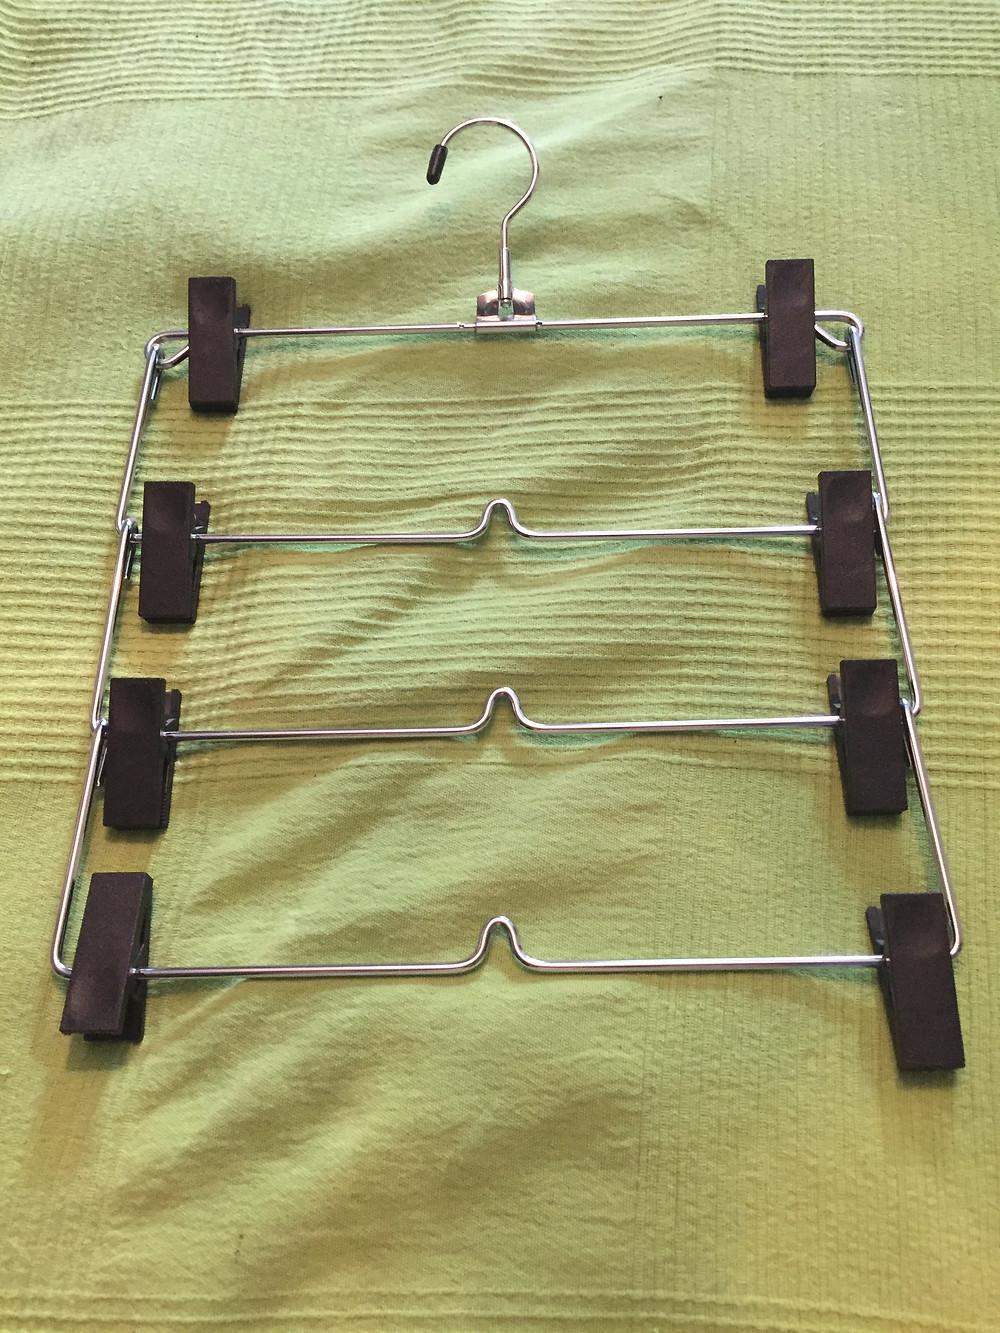 repurposed skirt hanger to organize boots